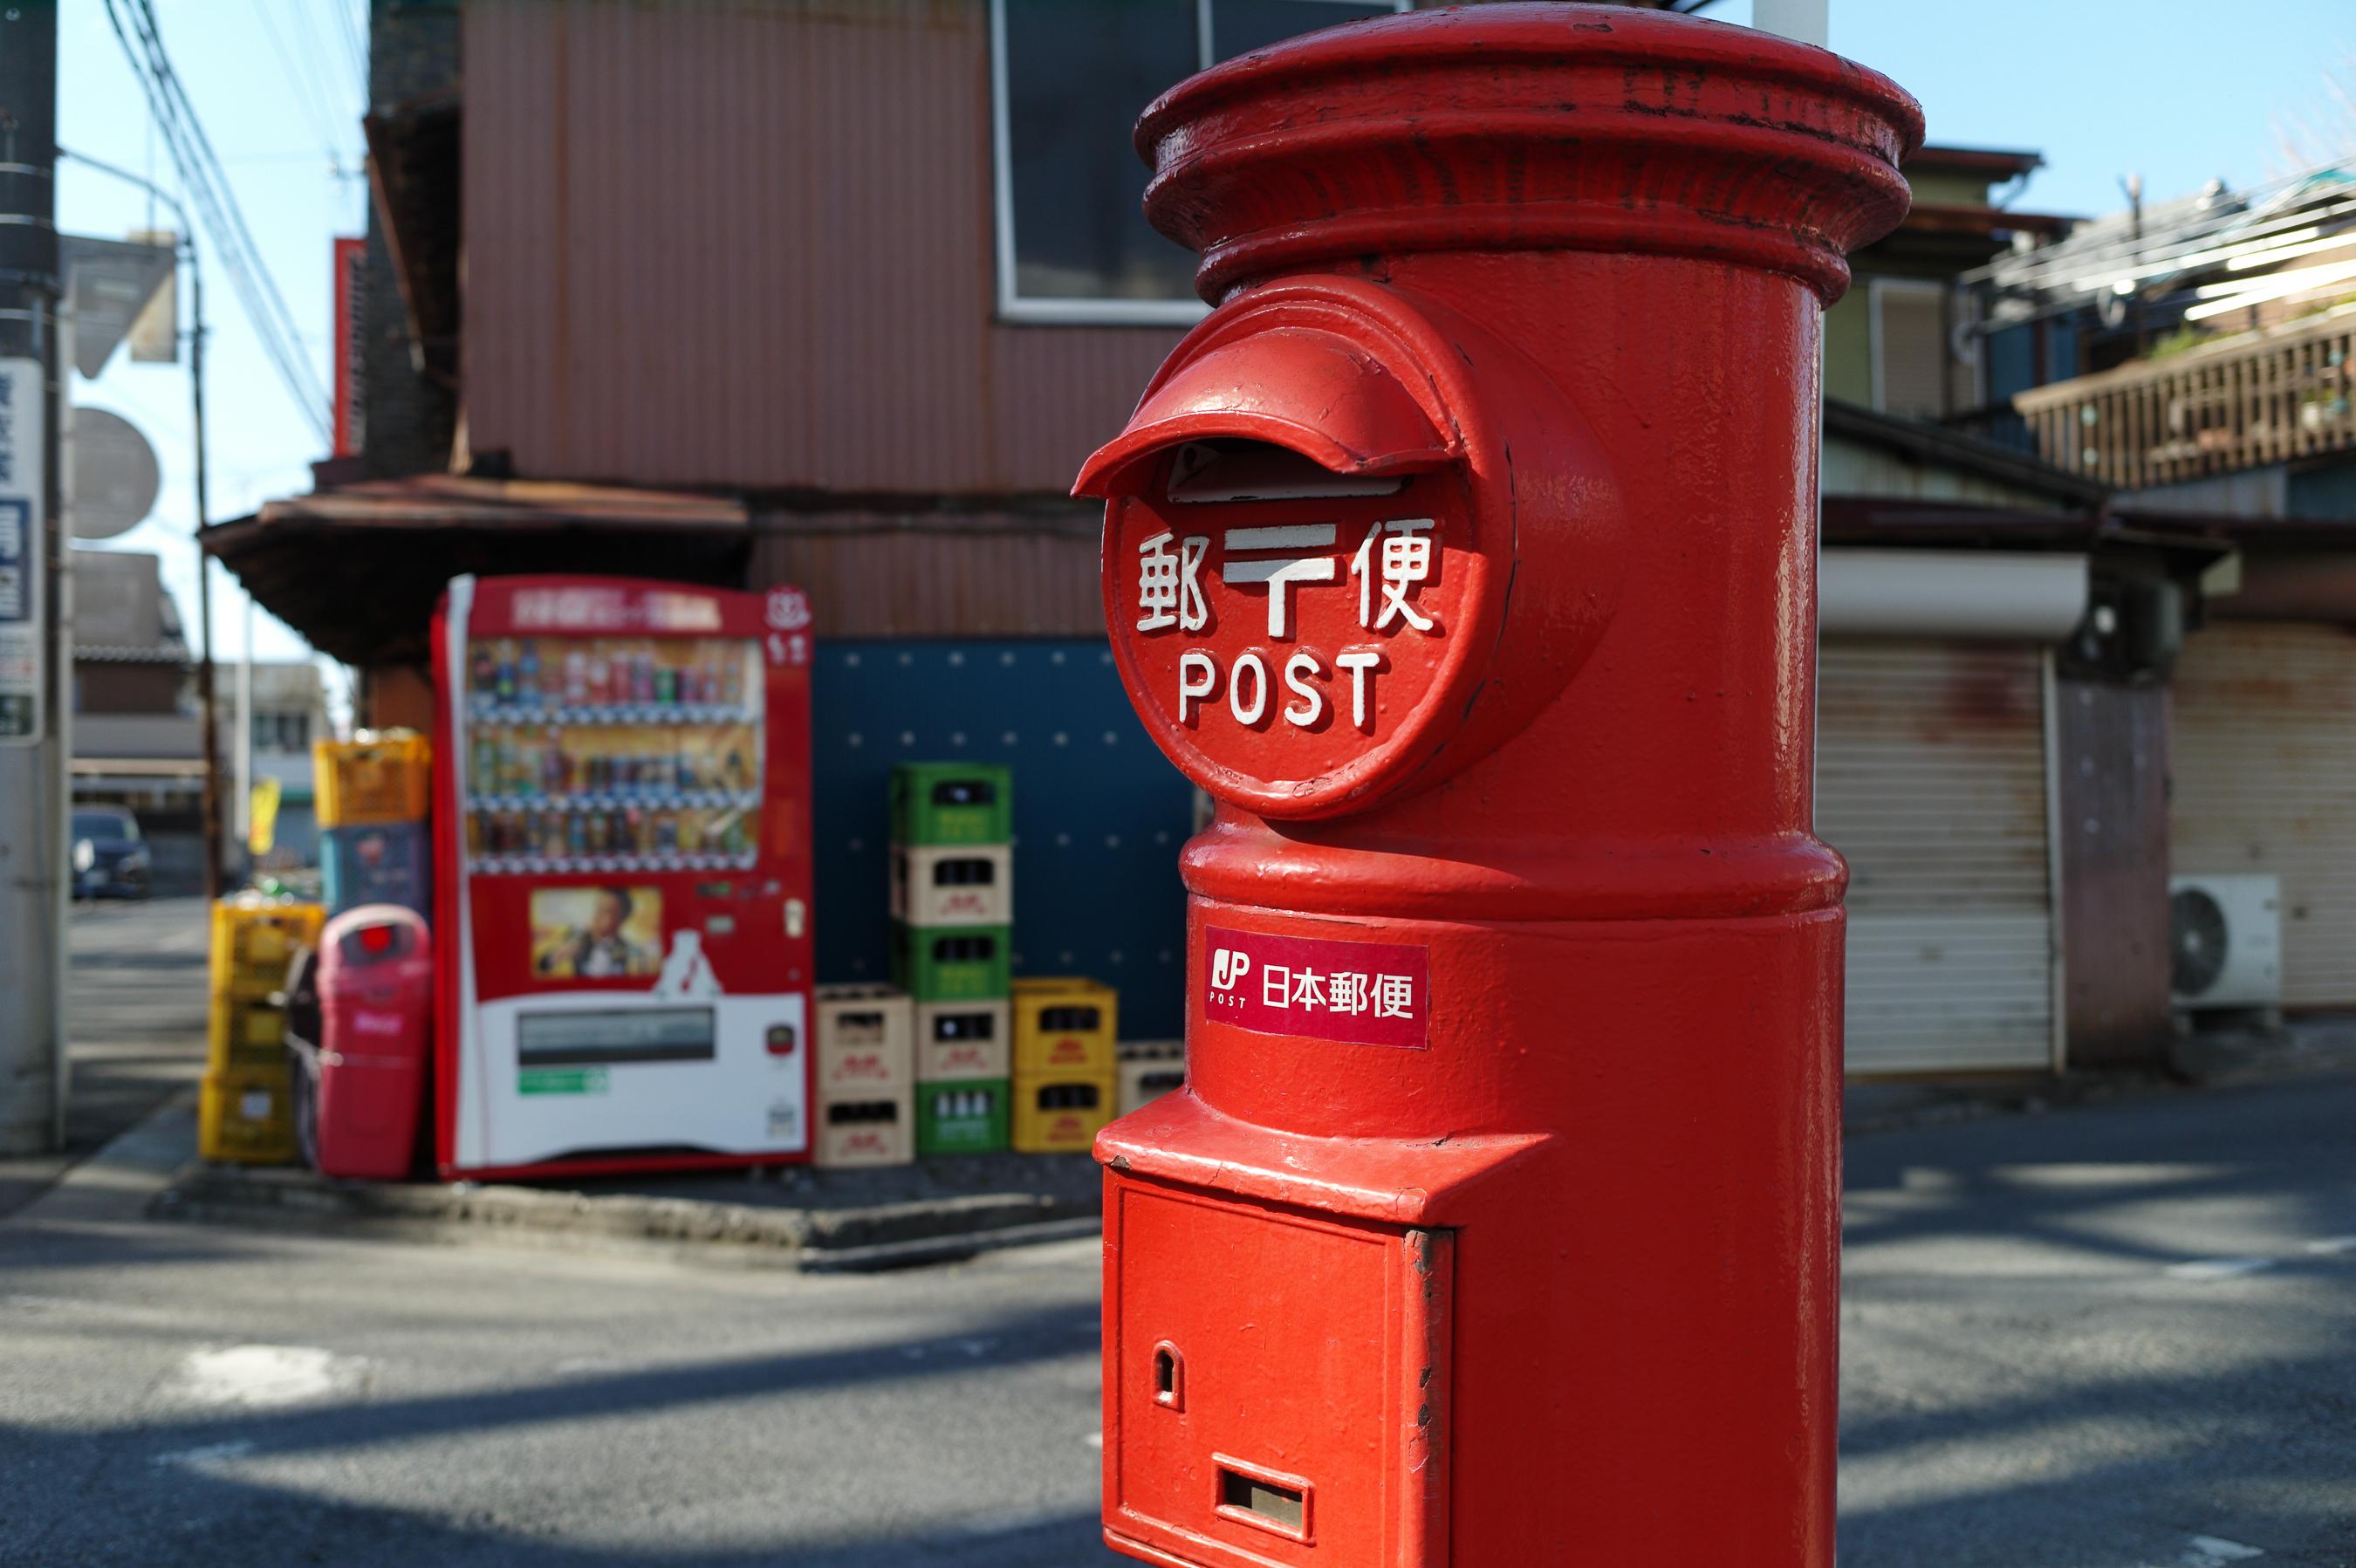 f:id:aoyama-takuro:20180212011241j:plain